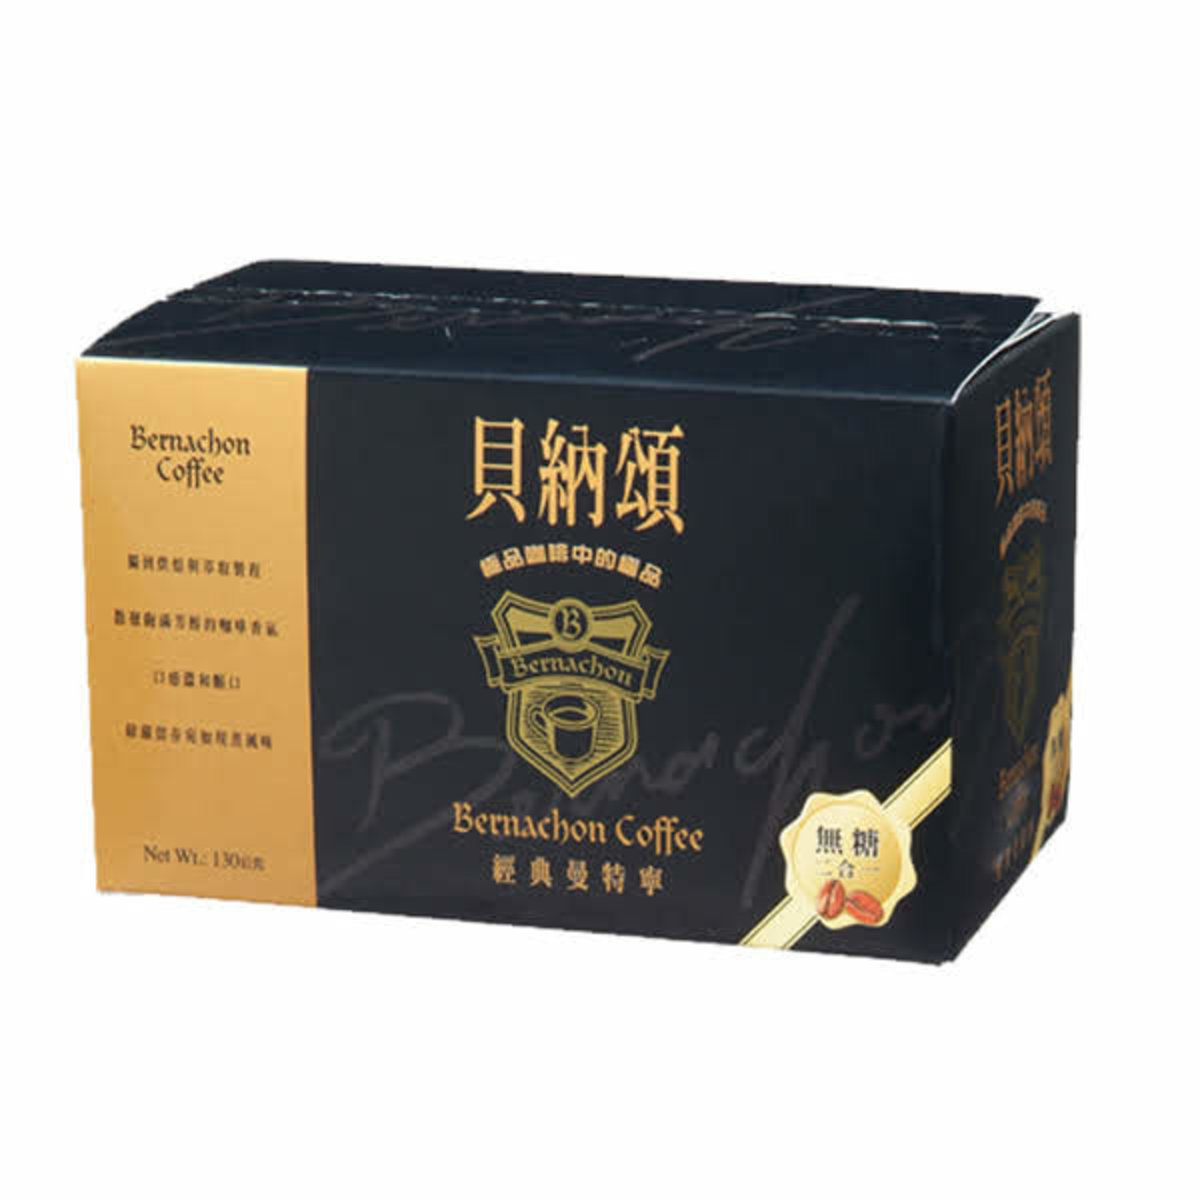 Bernachon Coffee 二合一無糖咖啡-經典曼特寧 10s